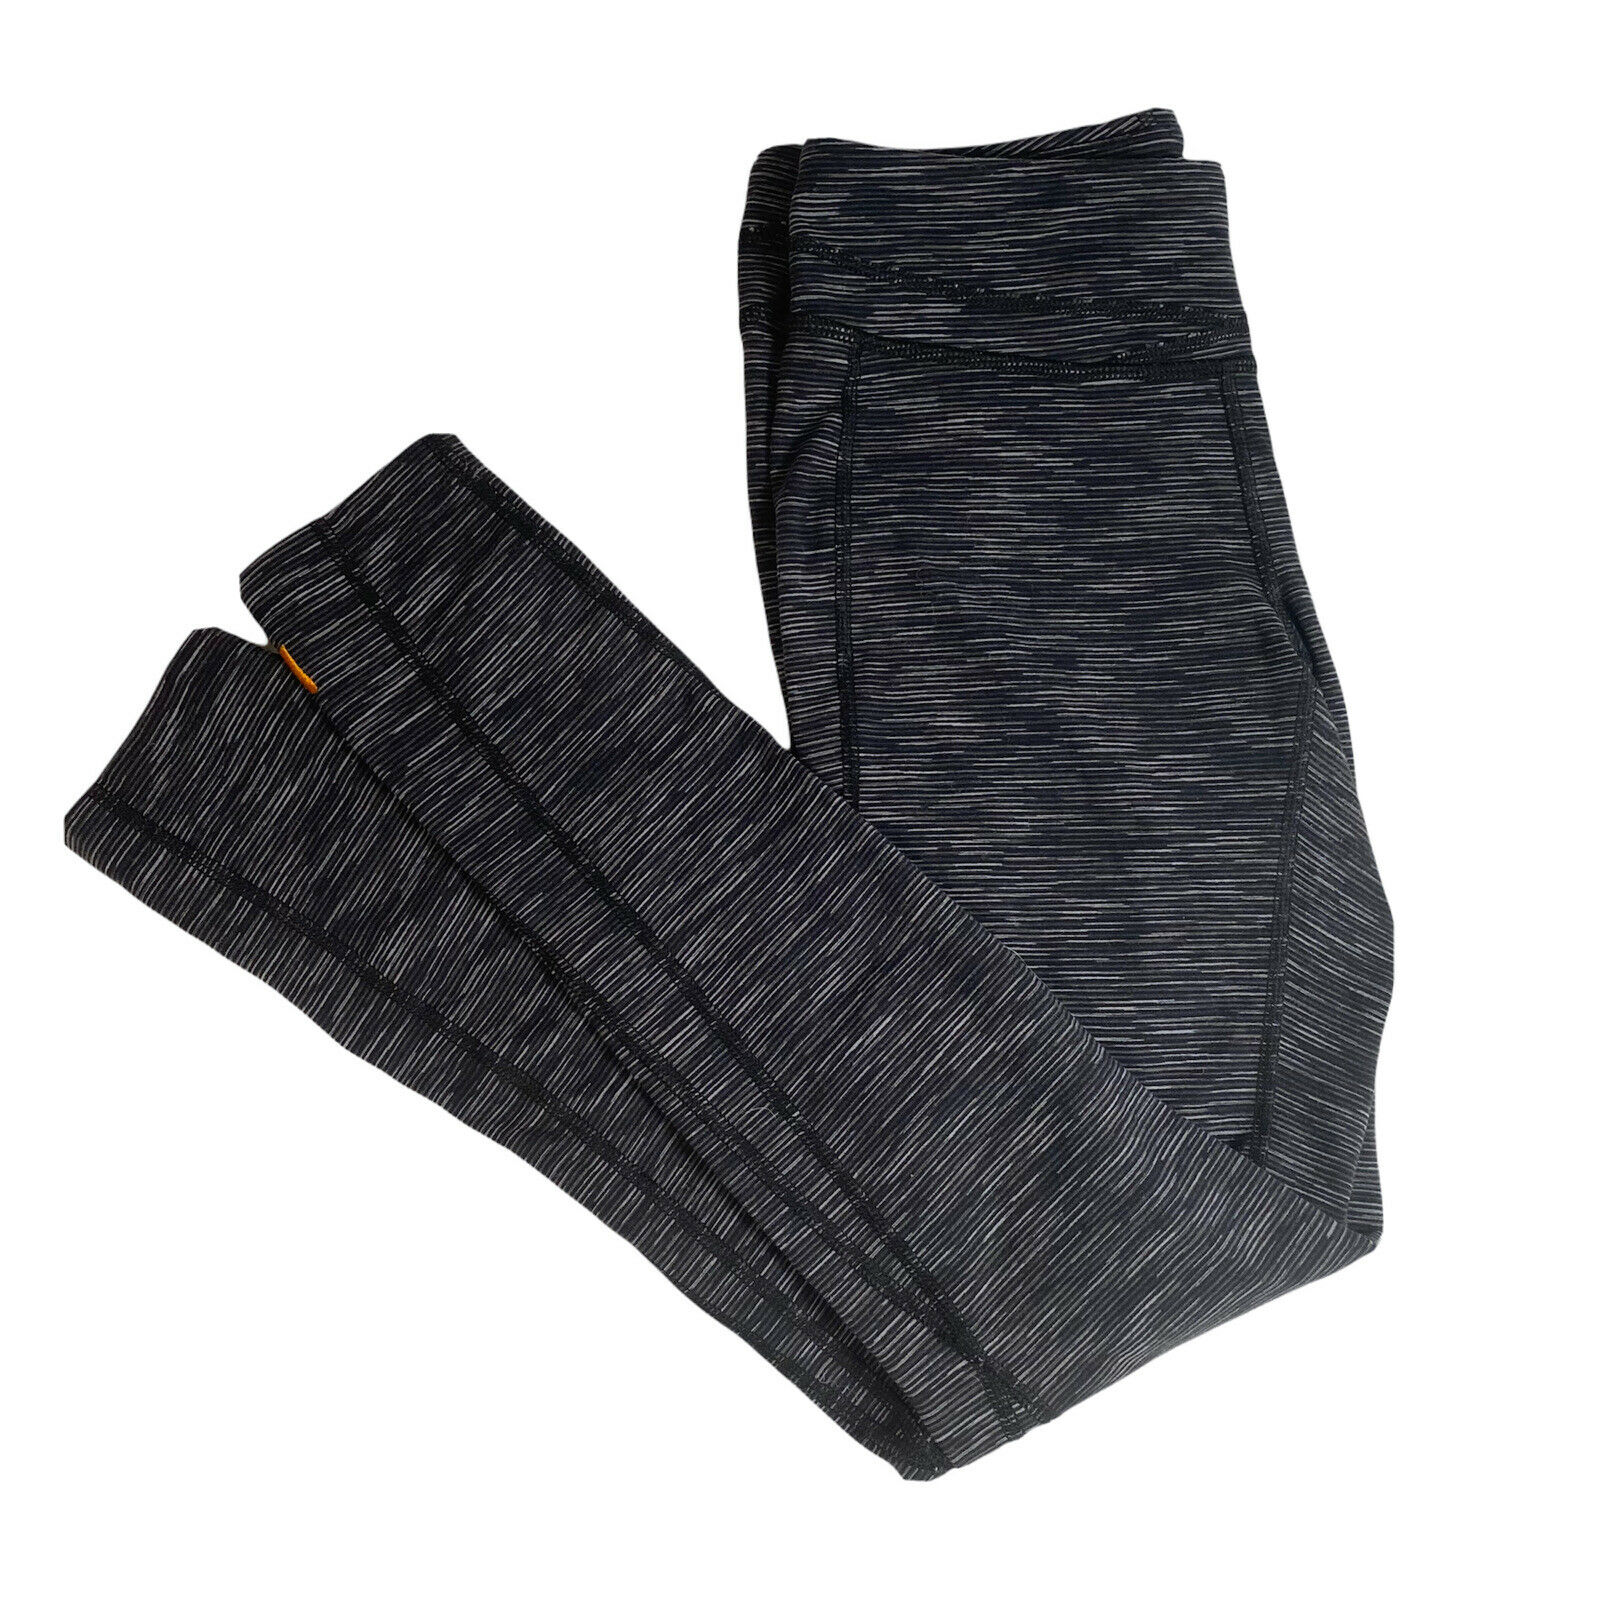 Lucy.com Womens Grey Black Striped Athletic Legging Long Spandex Supplex Nylon